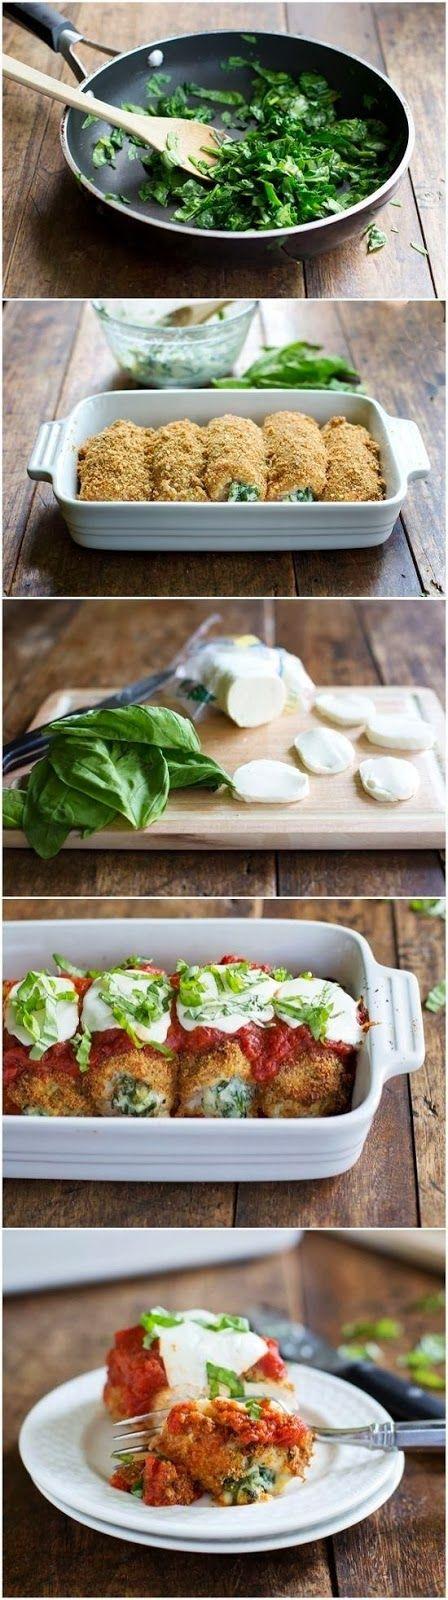 simple cooking, recipe : BAKED MOZZARELLA CHICKEN ROLLS